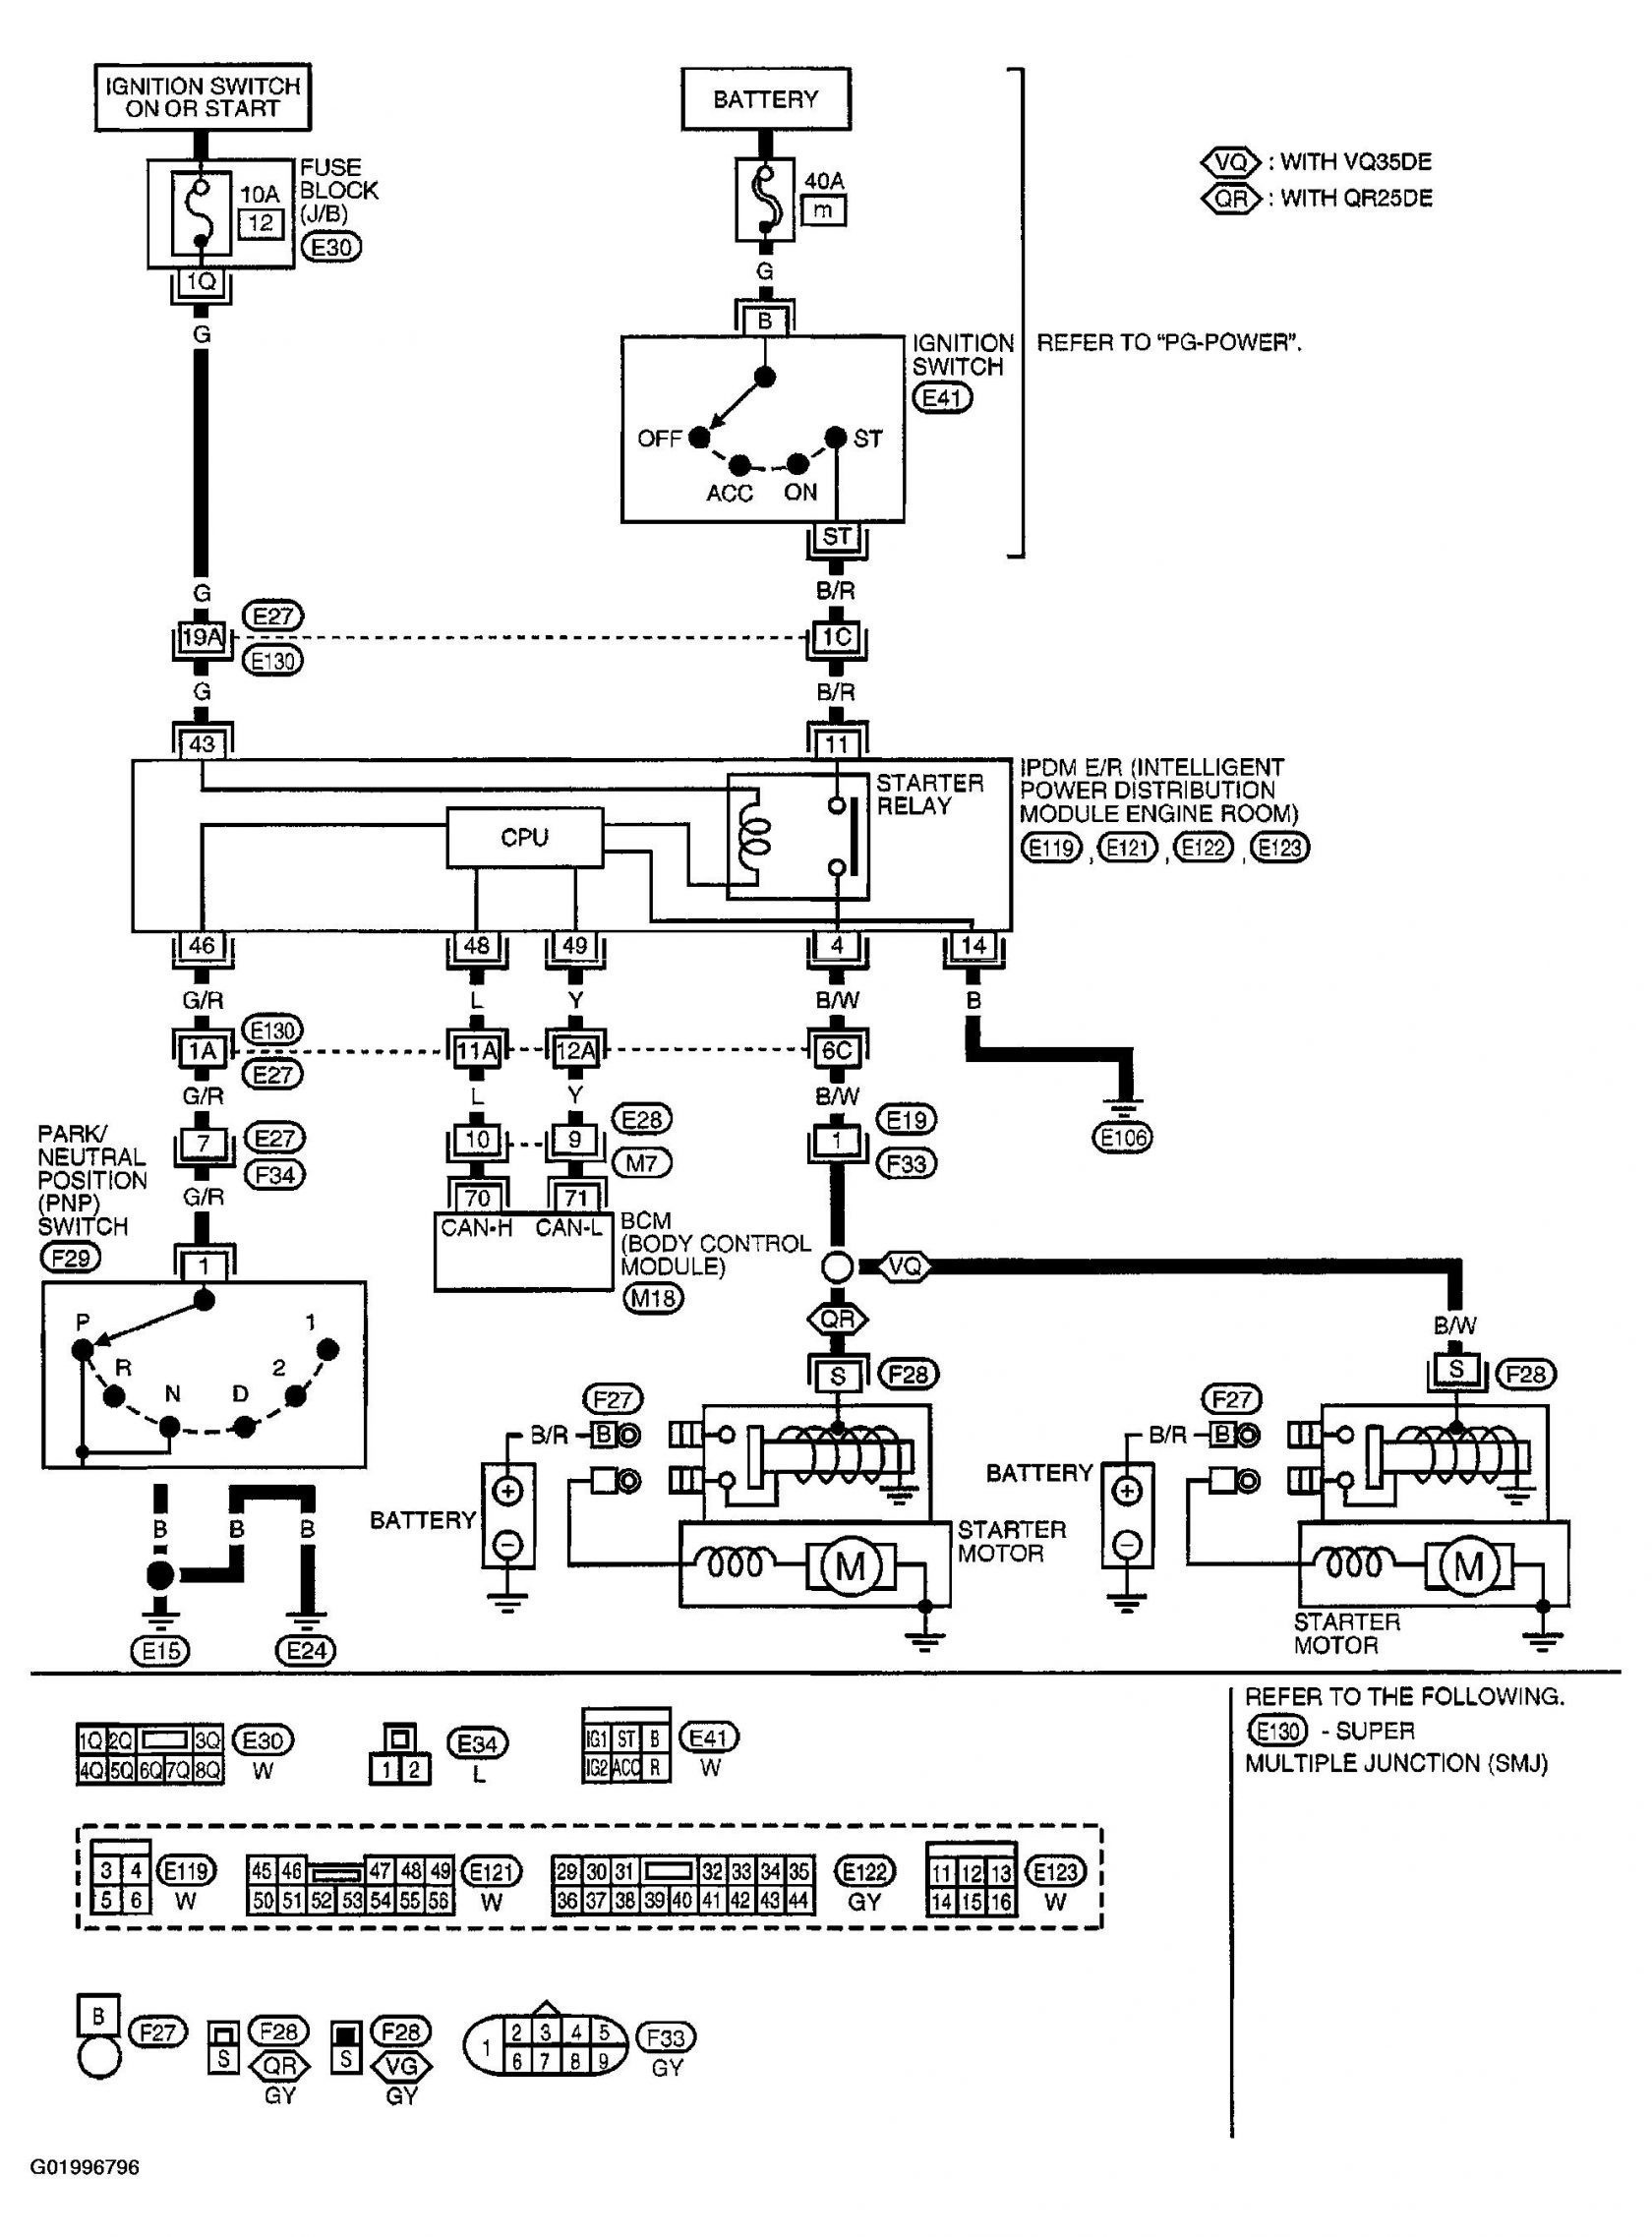 2002 Nissan Pathfinder Engine Diagram Nissan Navara D22 Radio Wiring Diagram Shahsramblings Of 2002 Nissan Pathfinder Engine Diagram 2003 Nissan Pathfinder 2wd 3 5l at Od Engine Idles 1100 1150 when